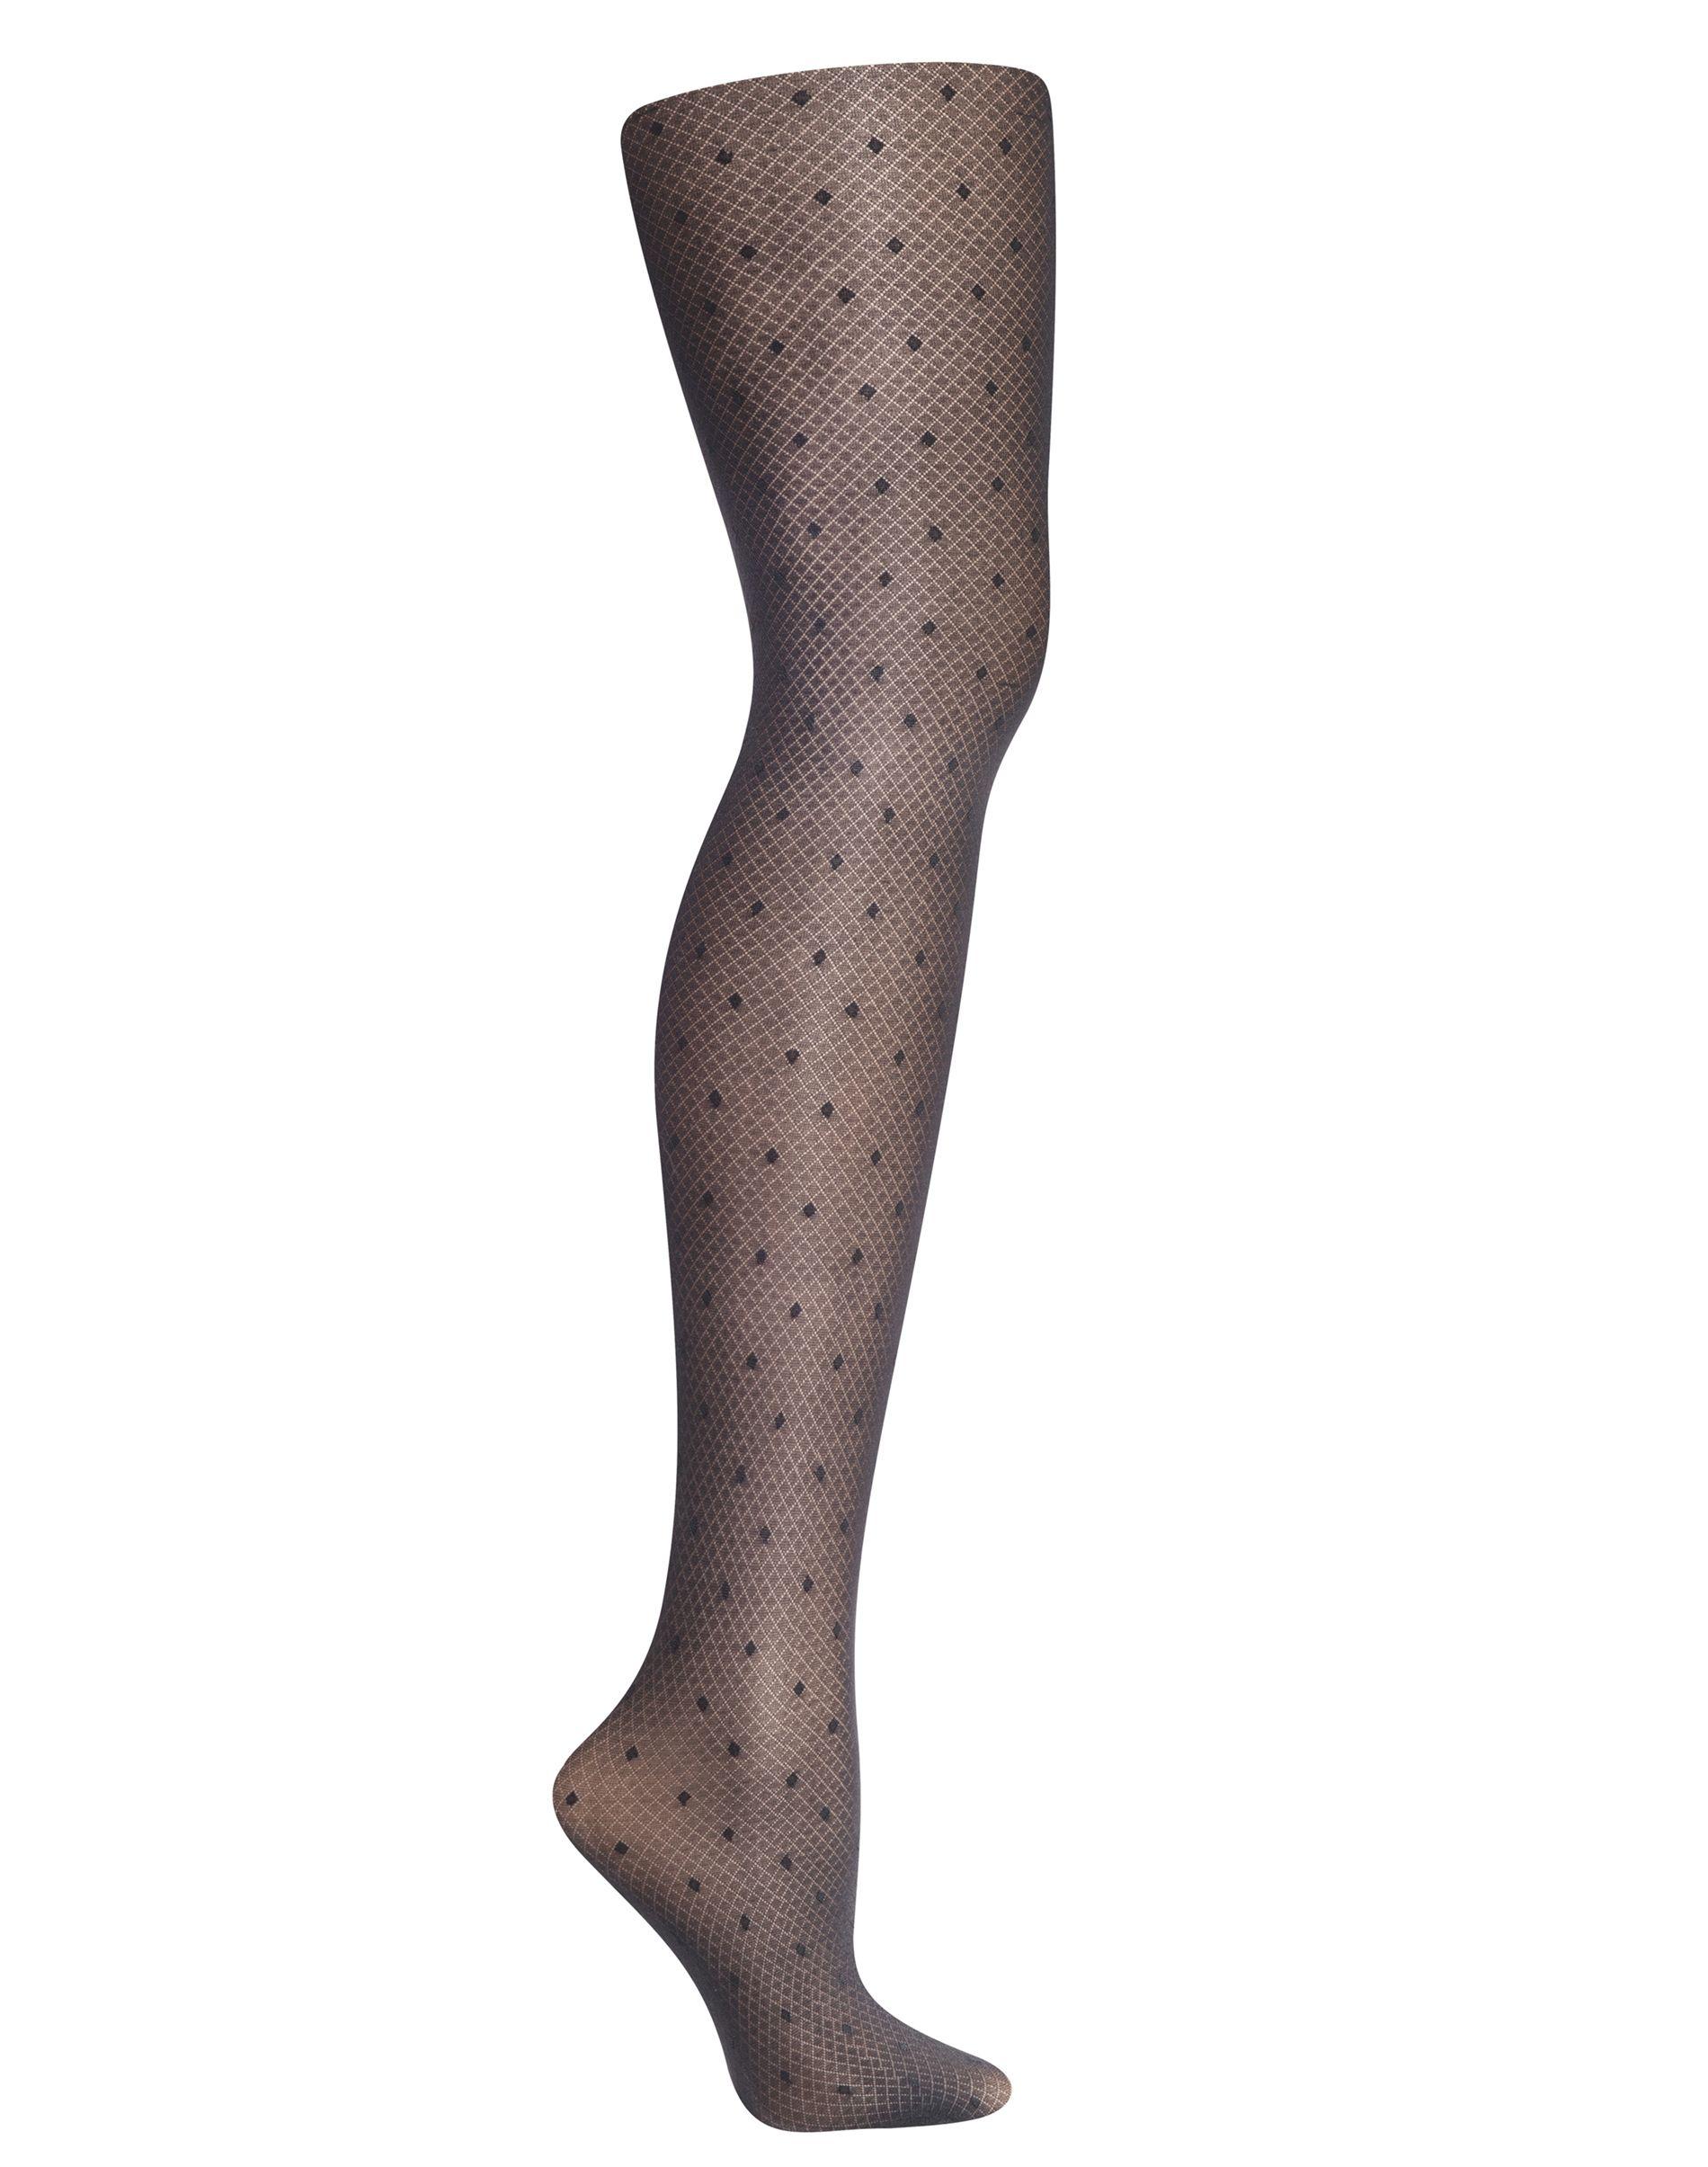 hanes diamond dot control top fashion tights women Hanes